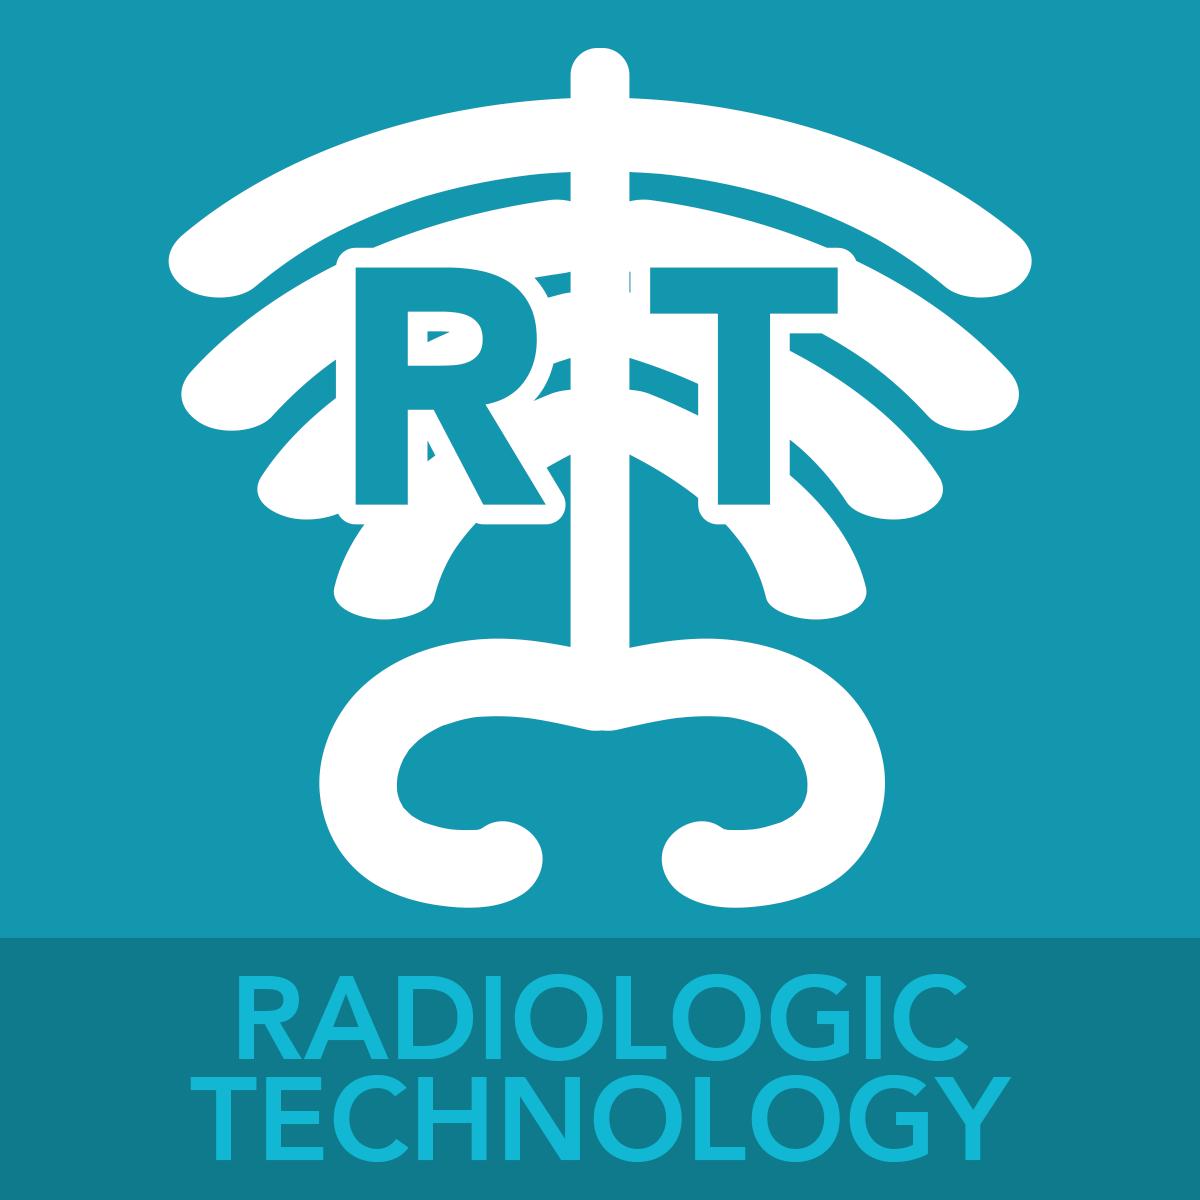 RADIOLOGIC TECHNOLOGY ICON BUTTON